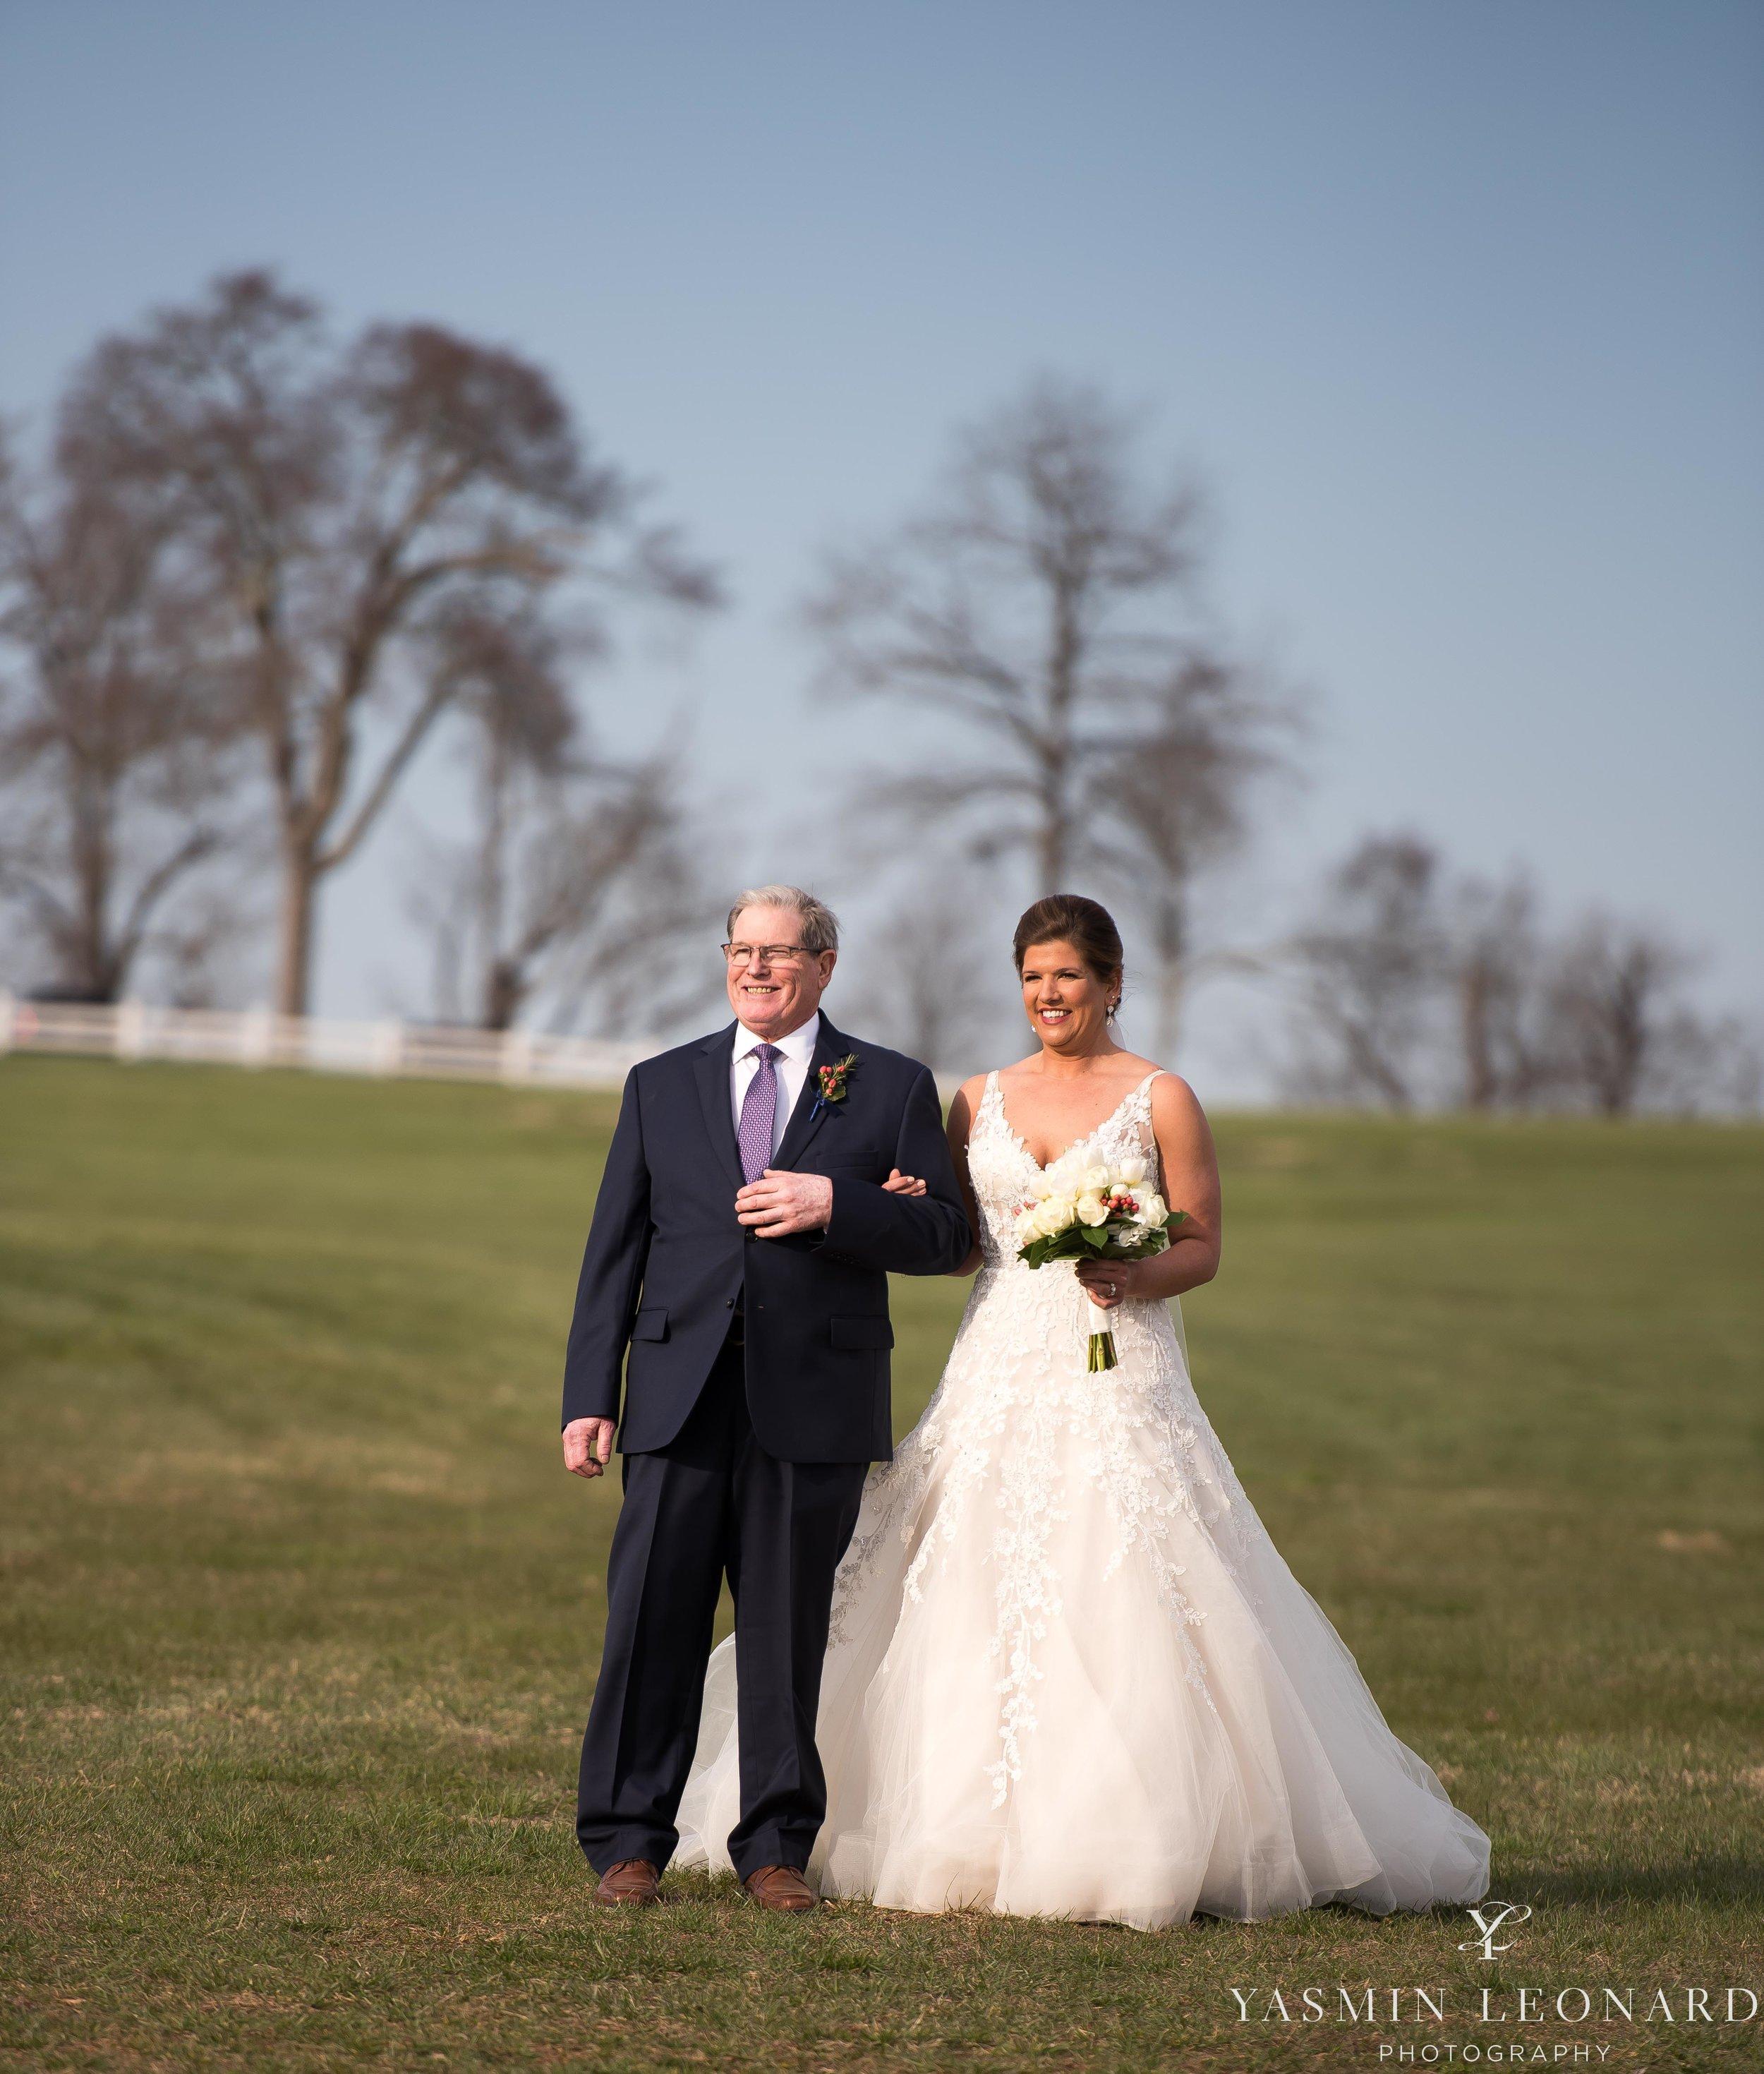 Adaumont Farm - Adaumont Farm Weddings - Trinity Weddings - NC Weddings - Yasmin Leonard Photography-27.jpg